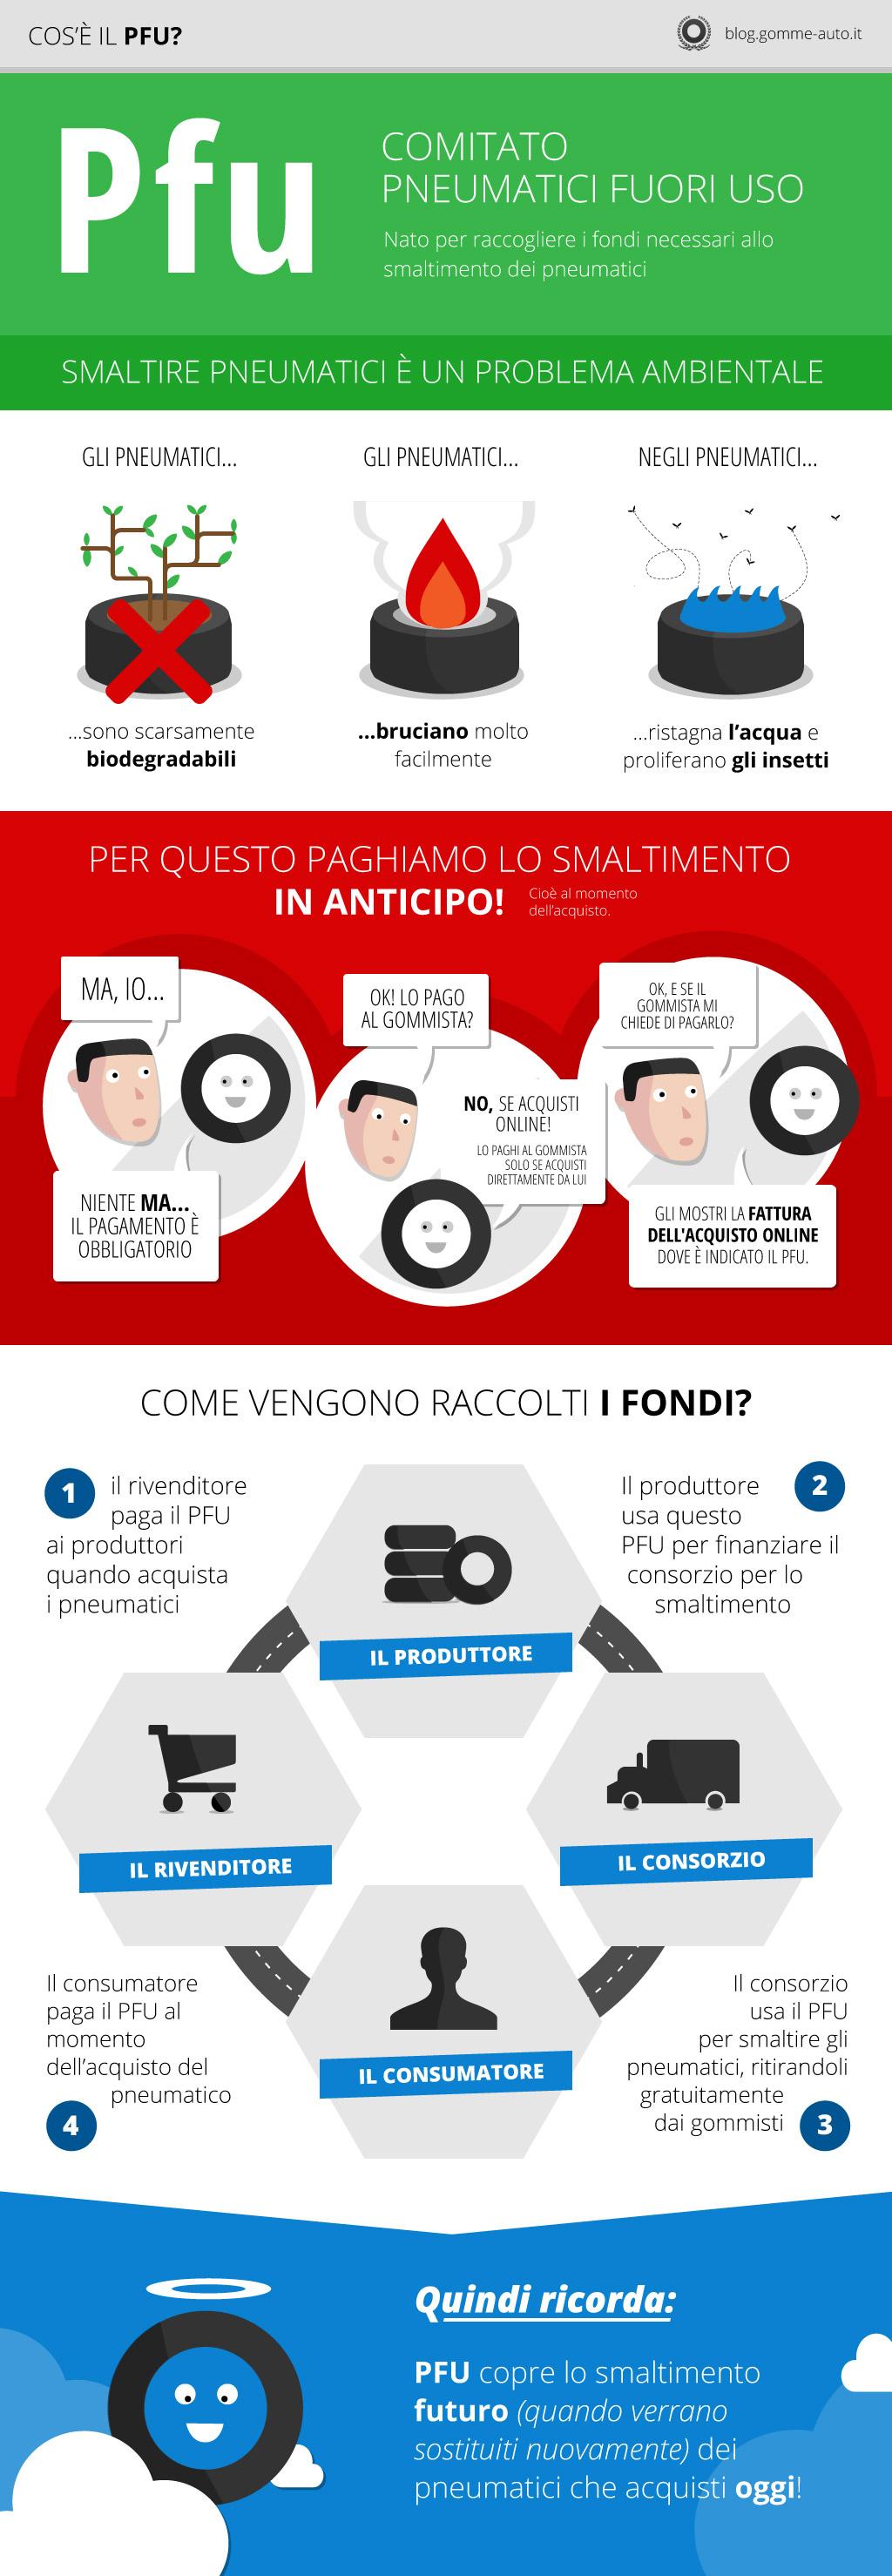 infografica sul PFU